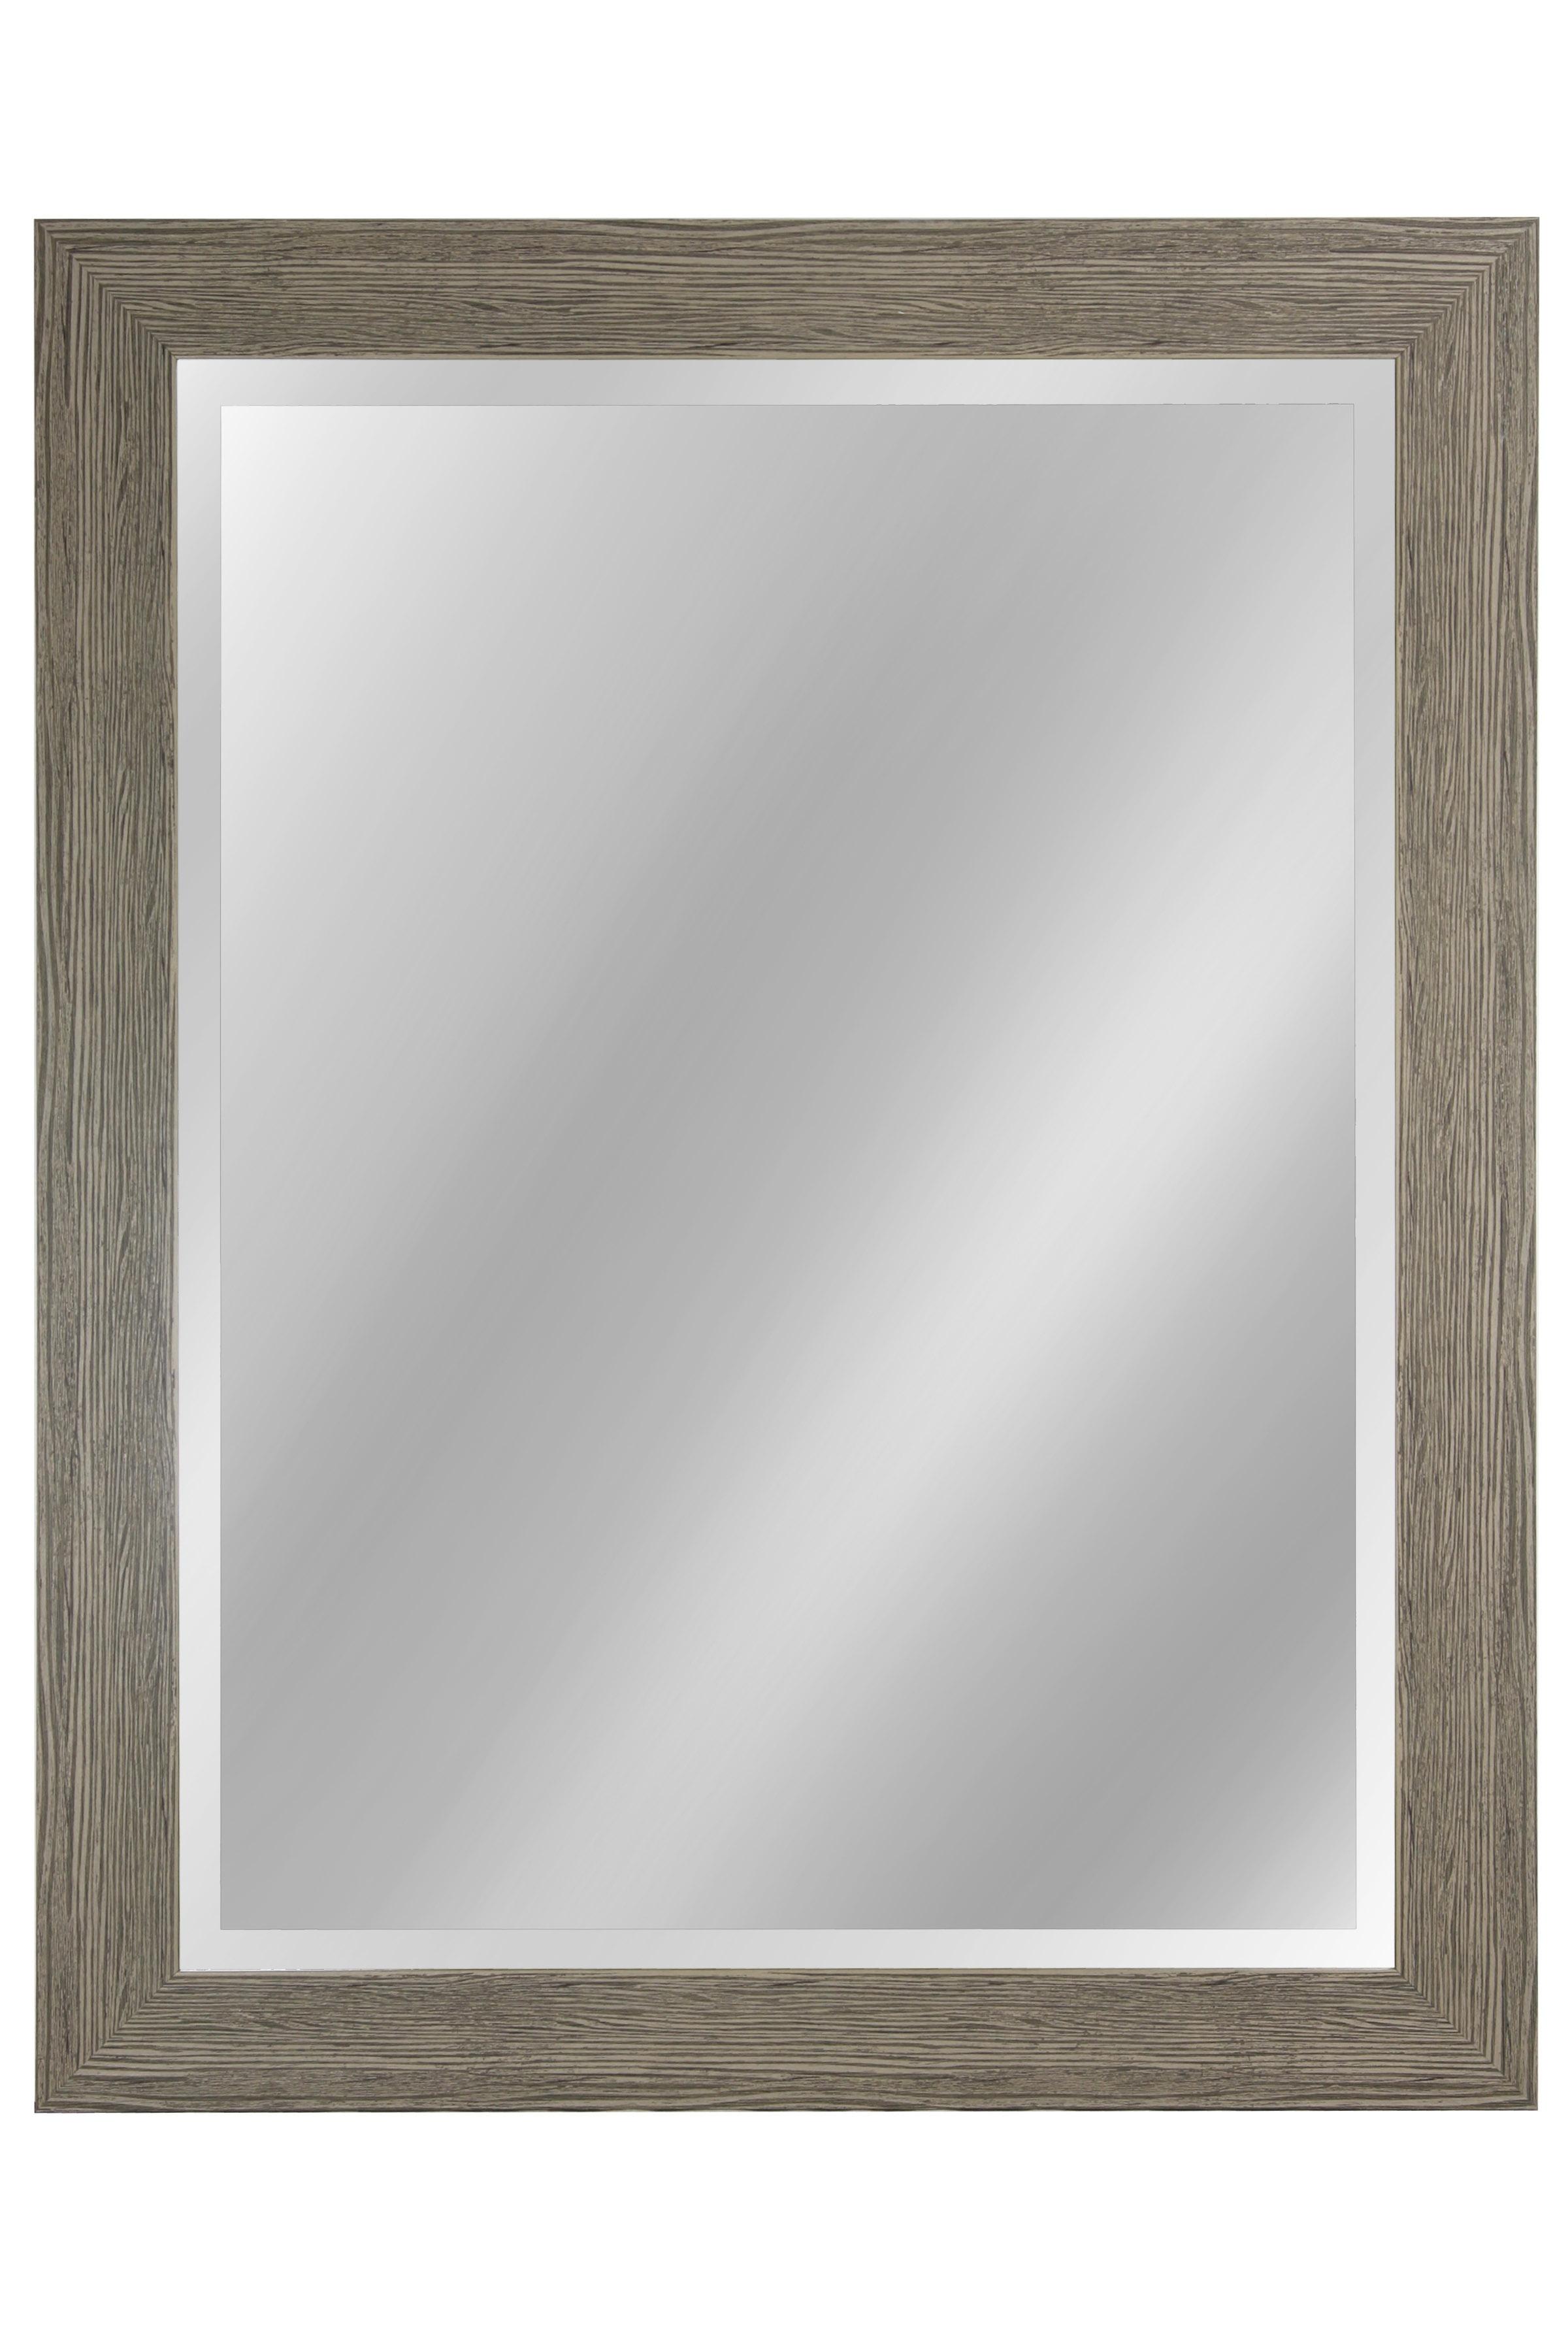 "42"" Beveled Mirror - Weathered Gray"